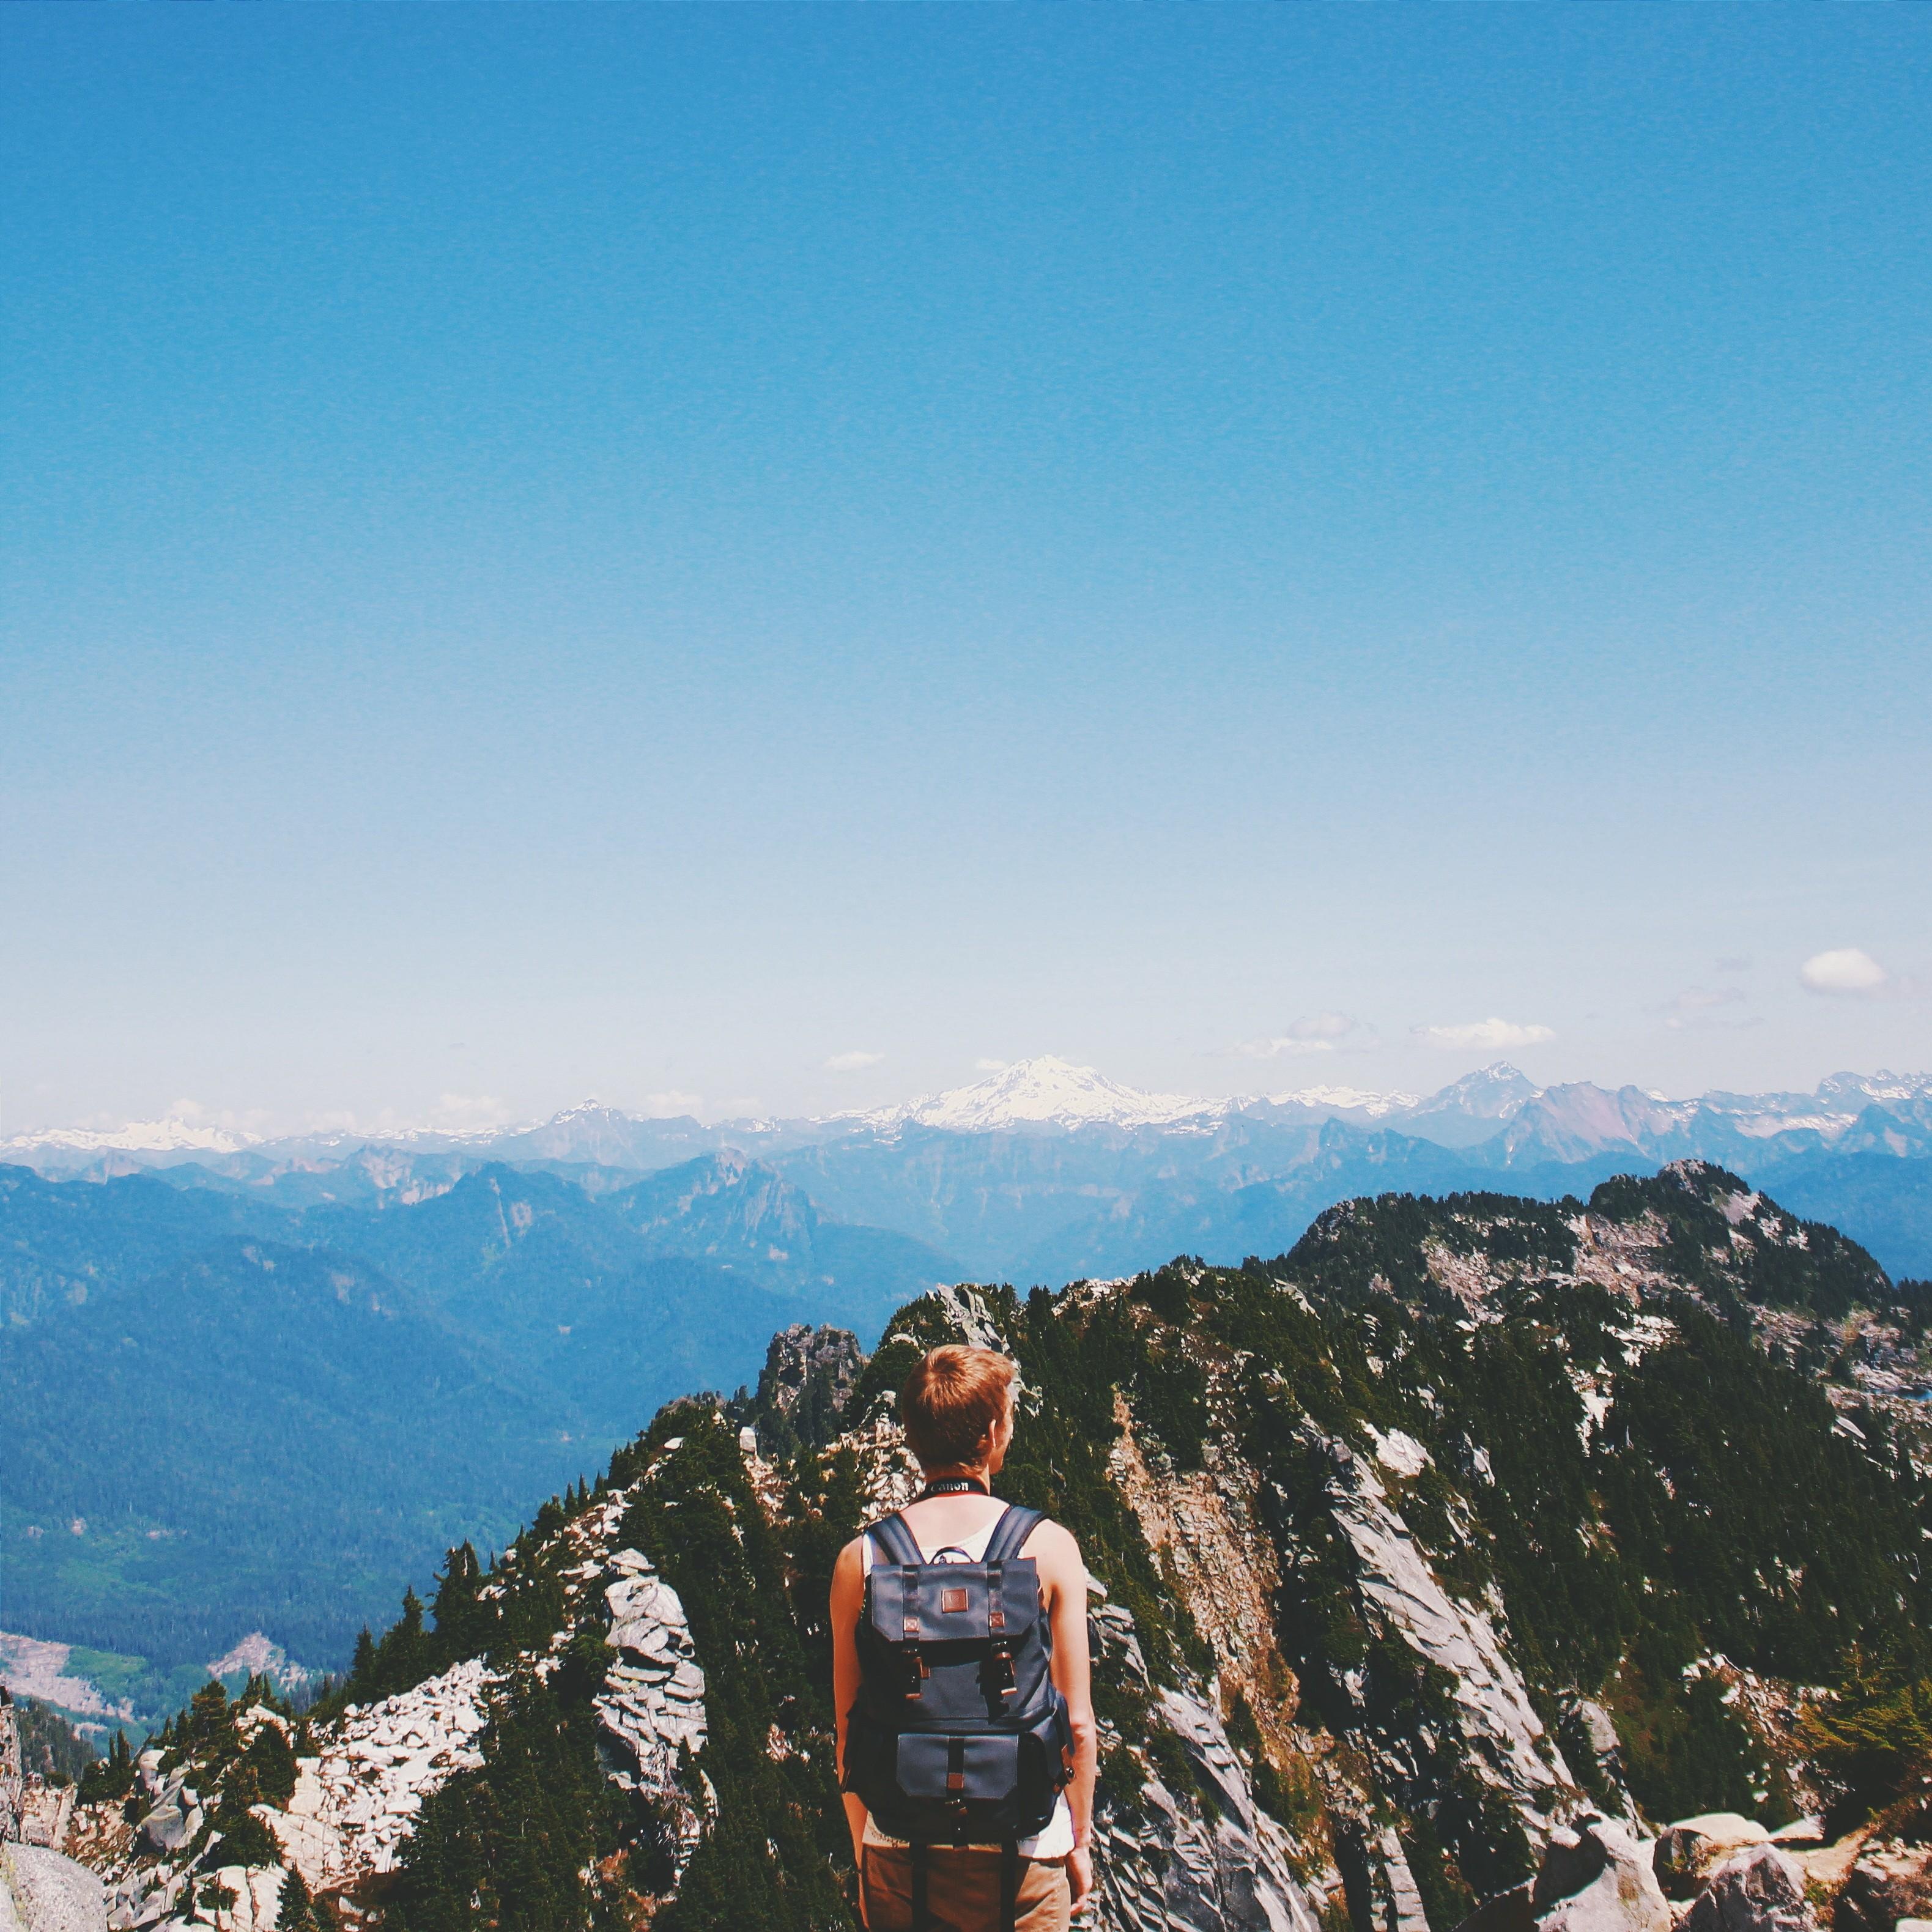 Amazing Wallpaper Mountain Portrait - sports-landscape-forest-mountains-women-portrait-nature-clear-sky-mountain-pass-wilderness-Alps-climbing-hiking-bag-walking-summit-plateau-vacation-ridge-mountain-adventure-recreation-backpacking-mountainous-landforms-landform-mountain-range-extreme-sport-outdoor-recreation-mountaineering-71599  Perfect Image Reference_645176.jpg